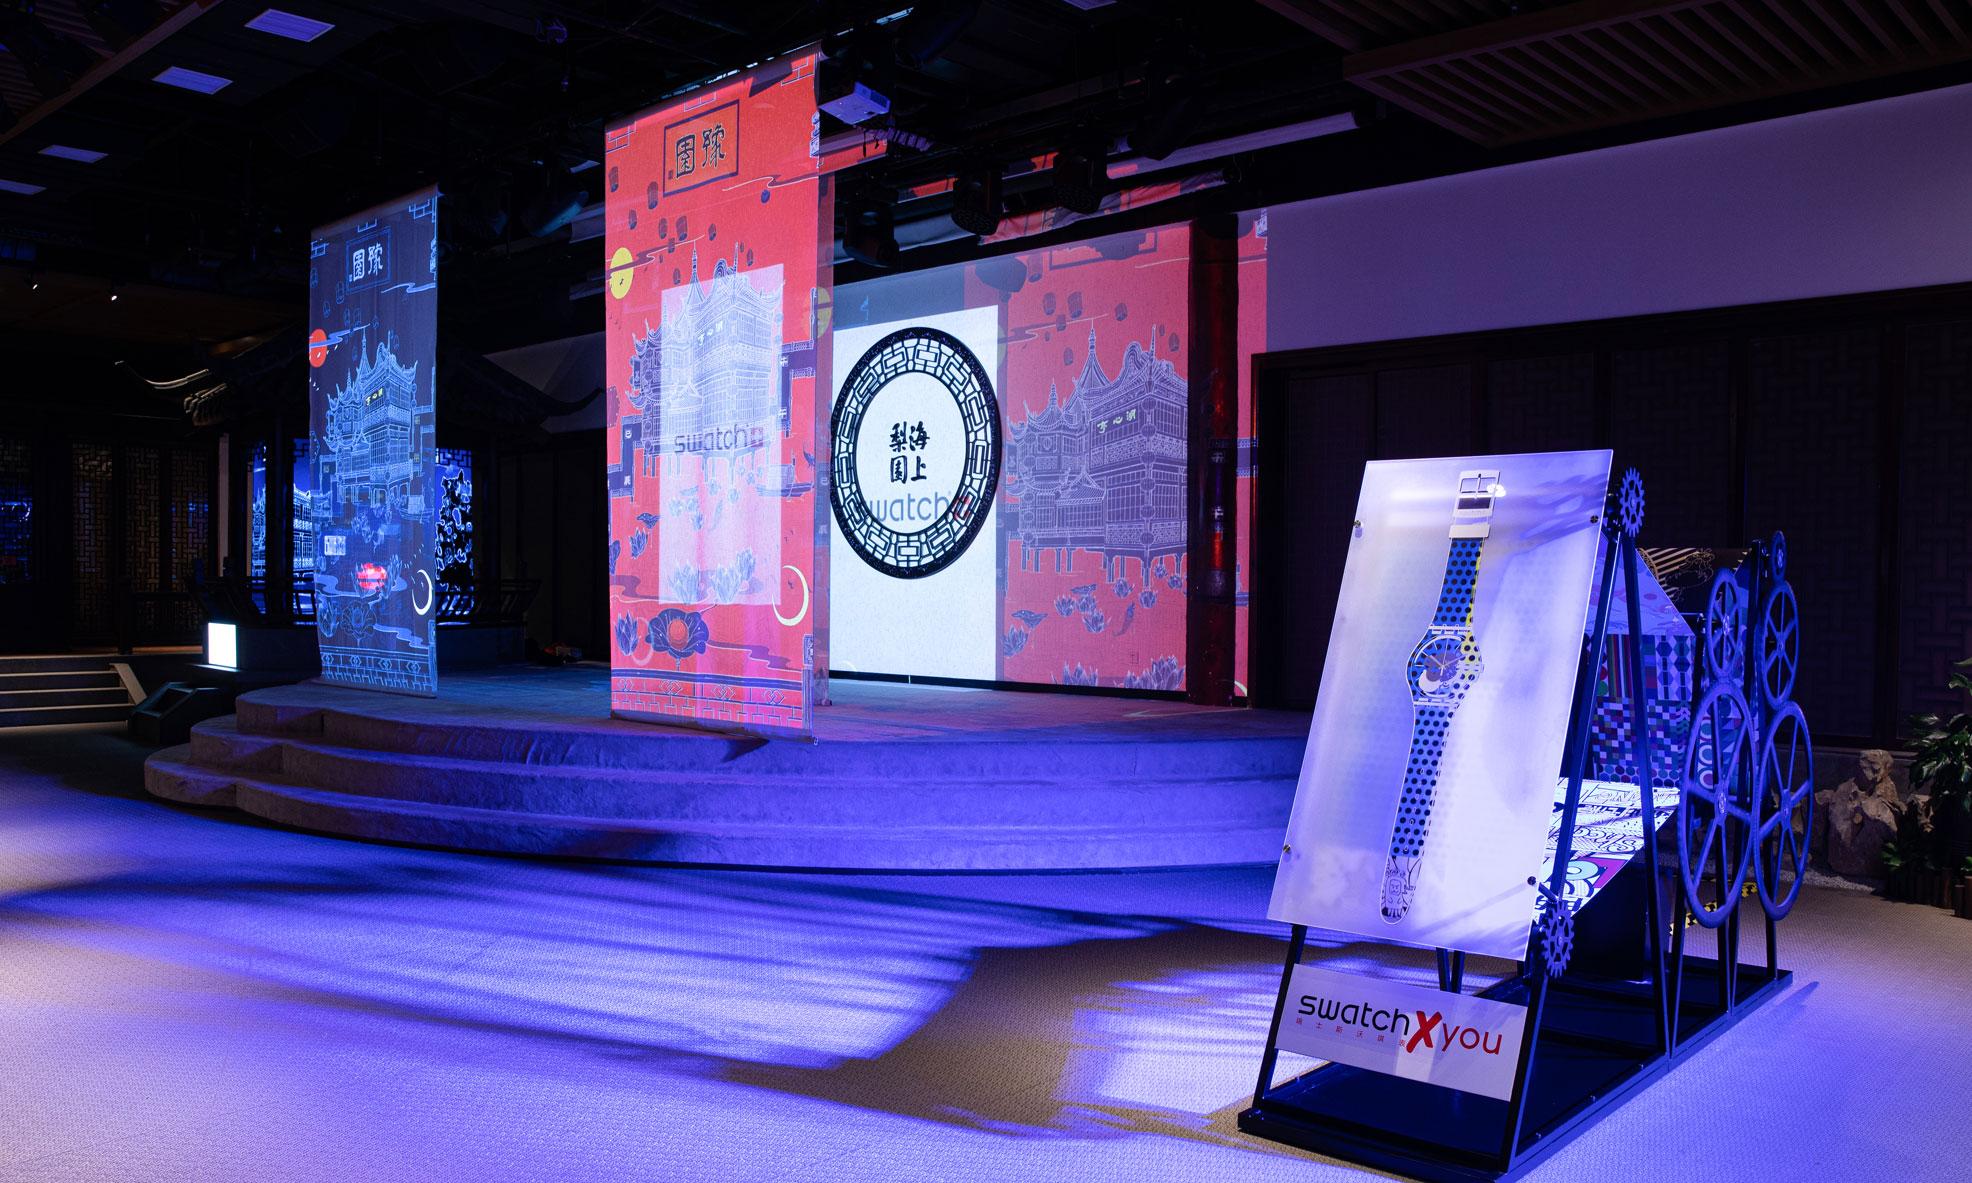 SWATCH 上海豫园概念店开幕,推出全新 SWATCH X YOU 设计